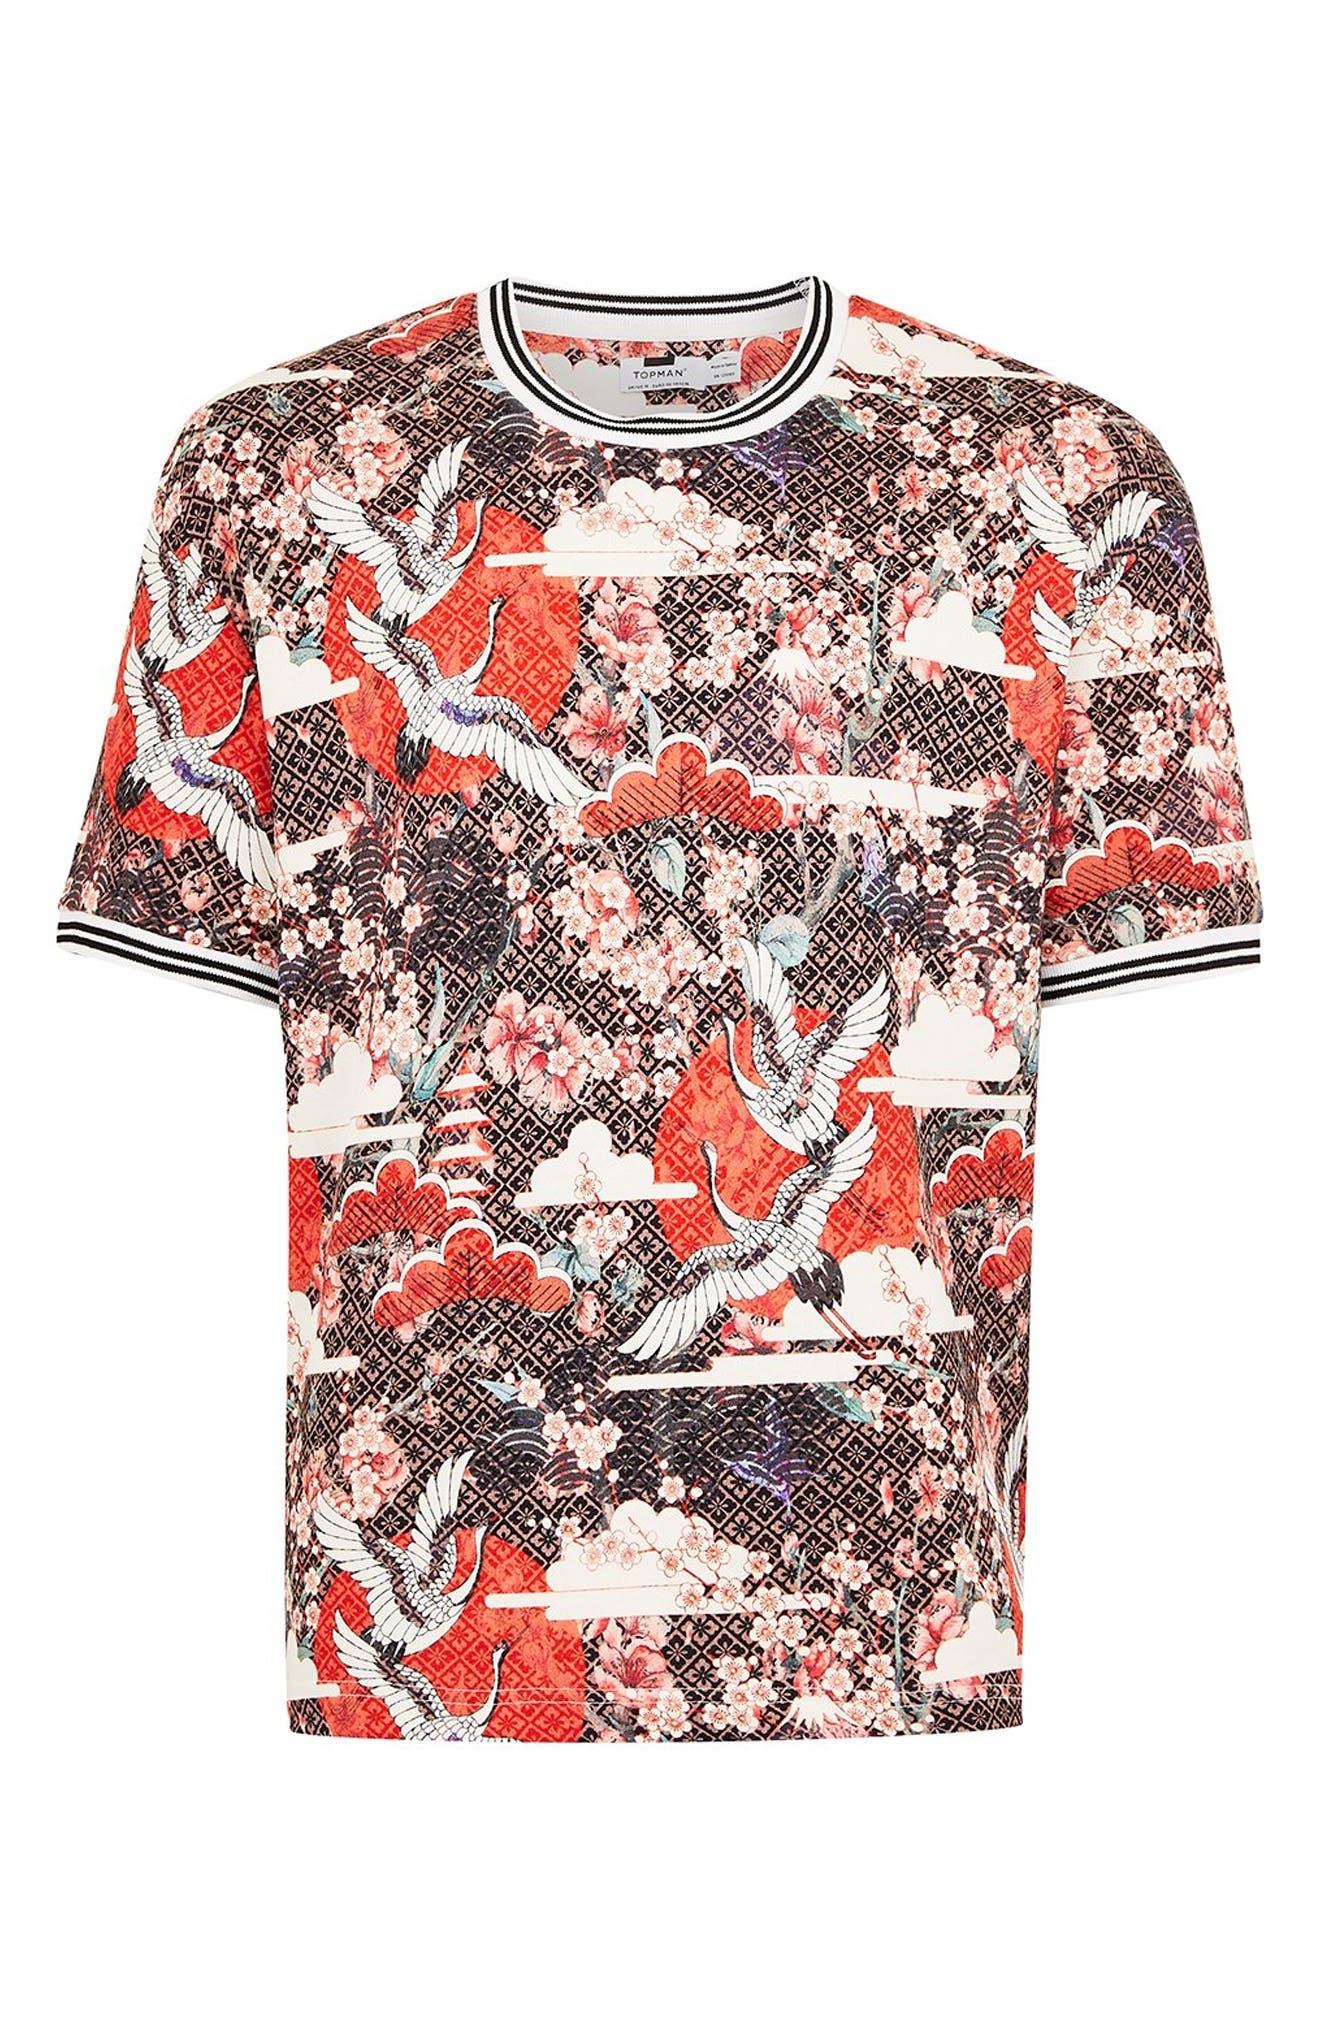 Japanese Tile Print Short Sleeve Sweatshirt,                             Alternate thumbnail 4, color,                             600